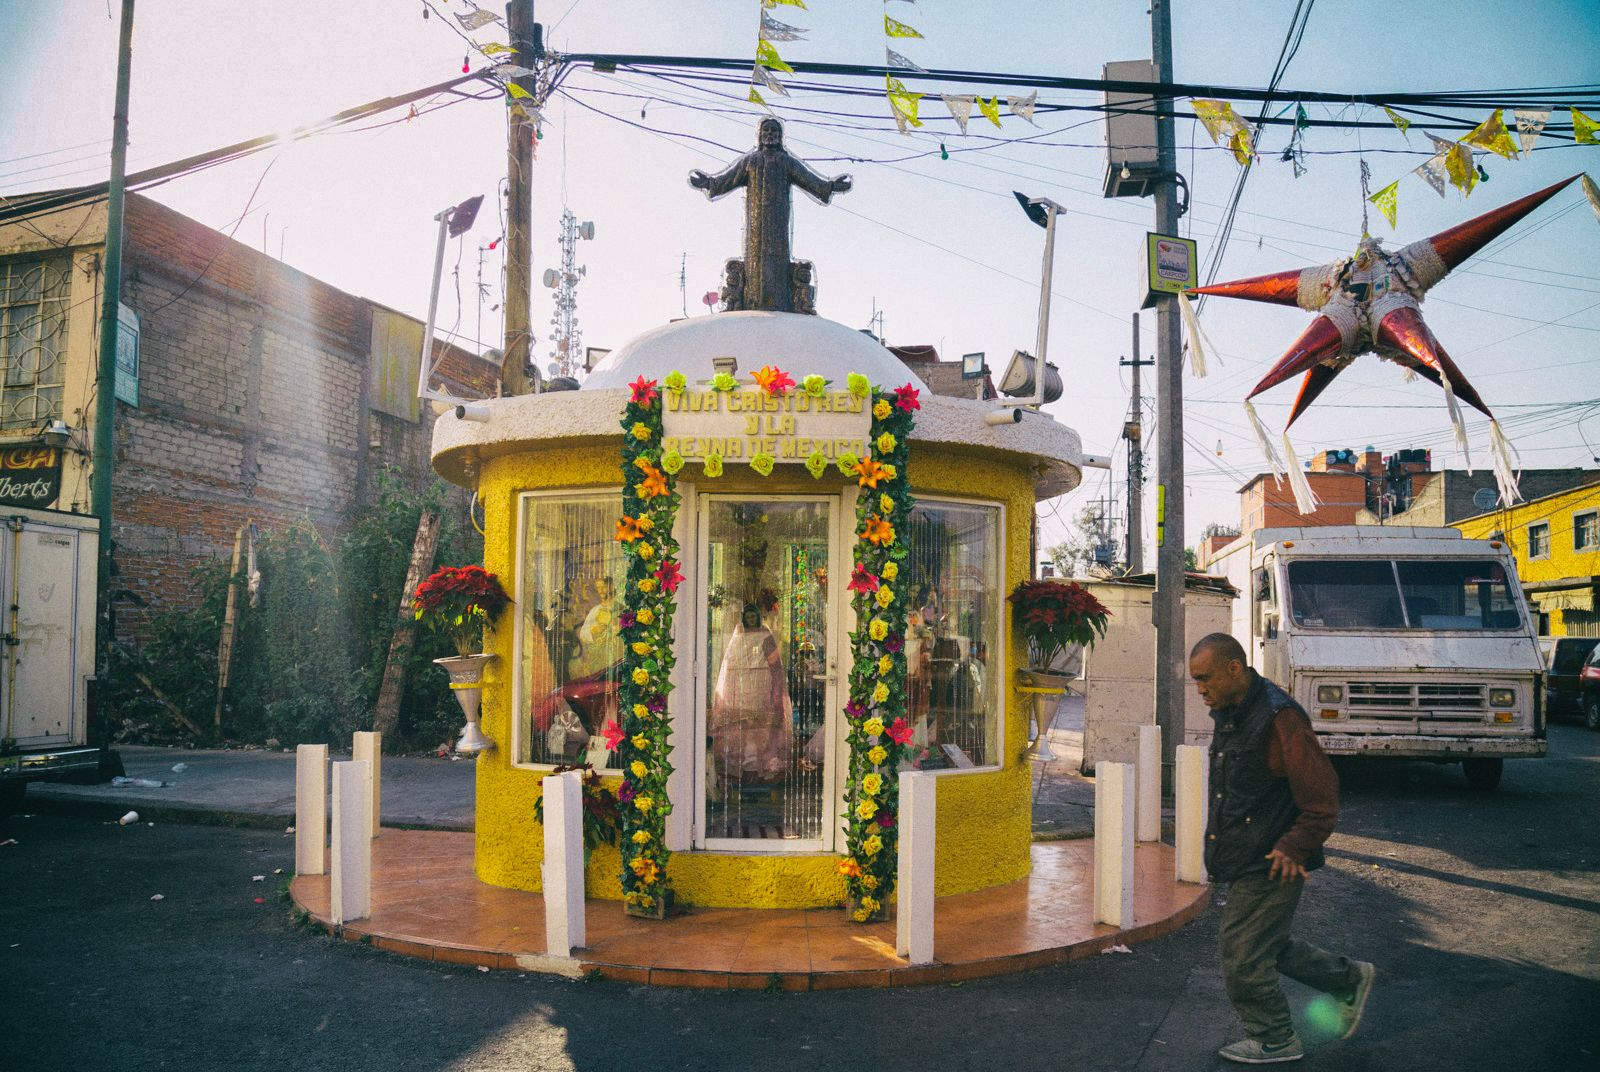 Altar de la esquina del movimiento. Irving Cabello.